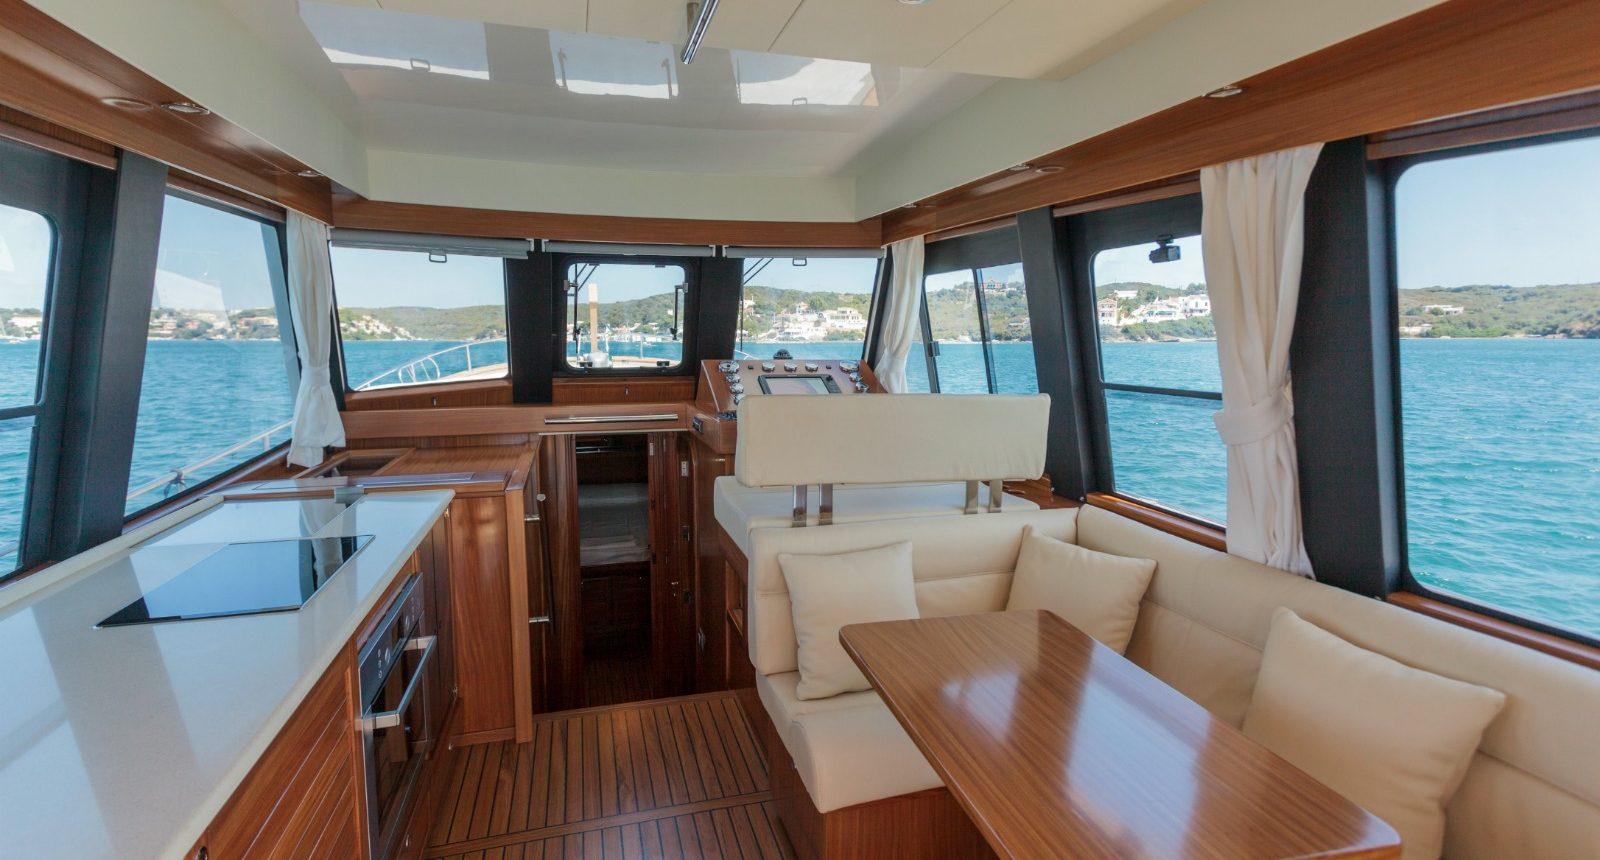 Minorca Islander 42 for sale - salon and galley